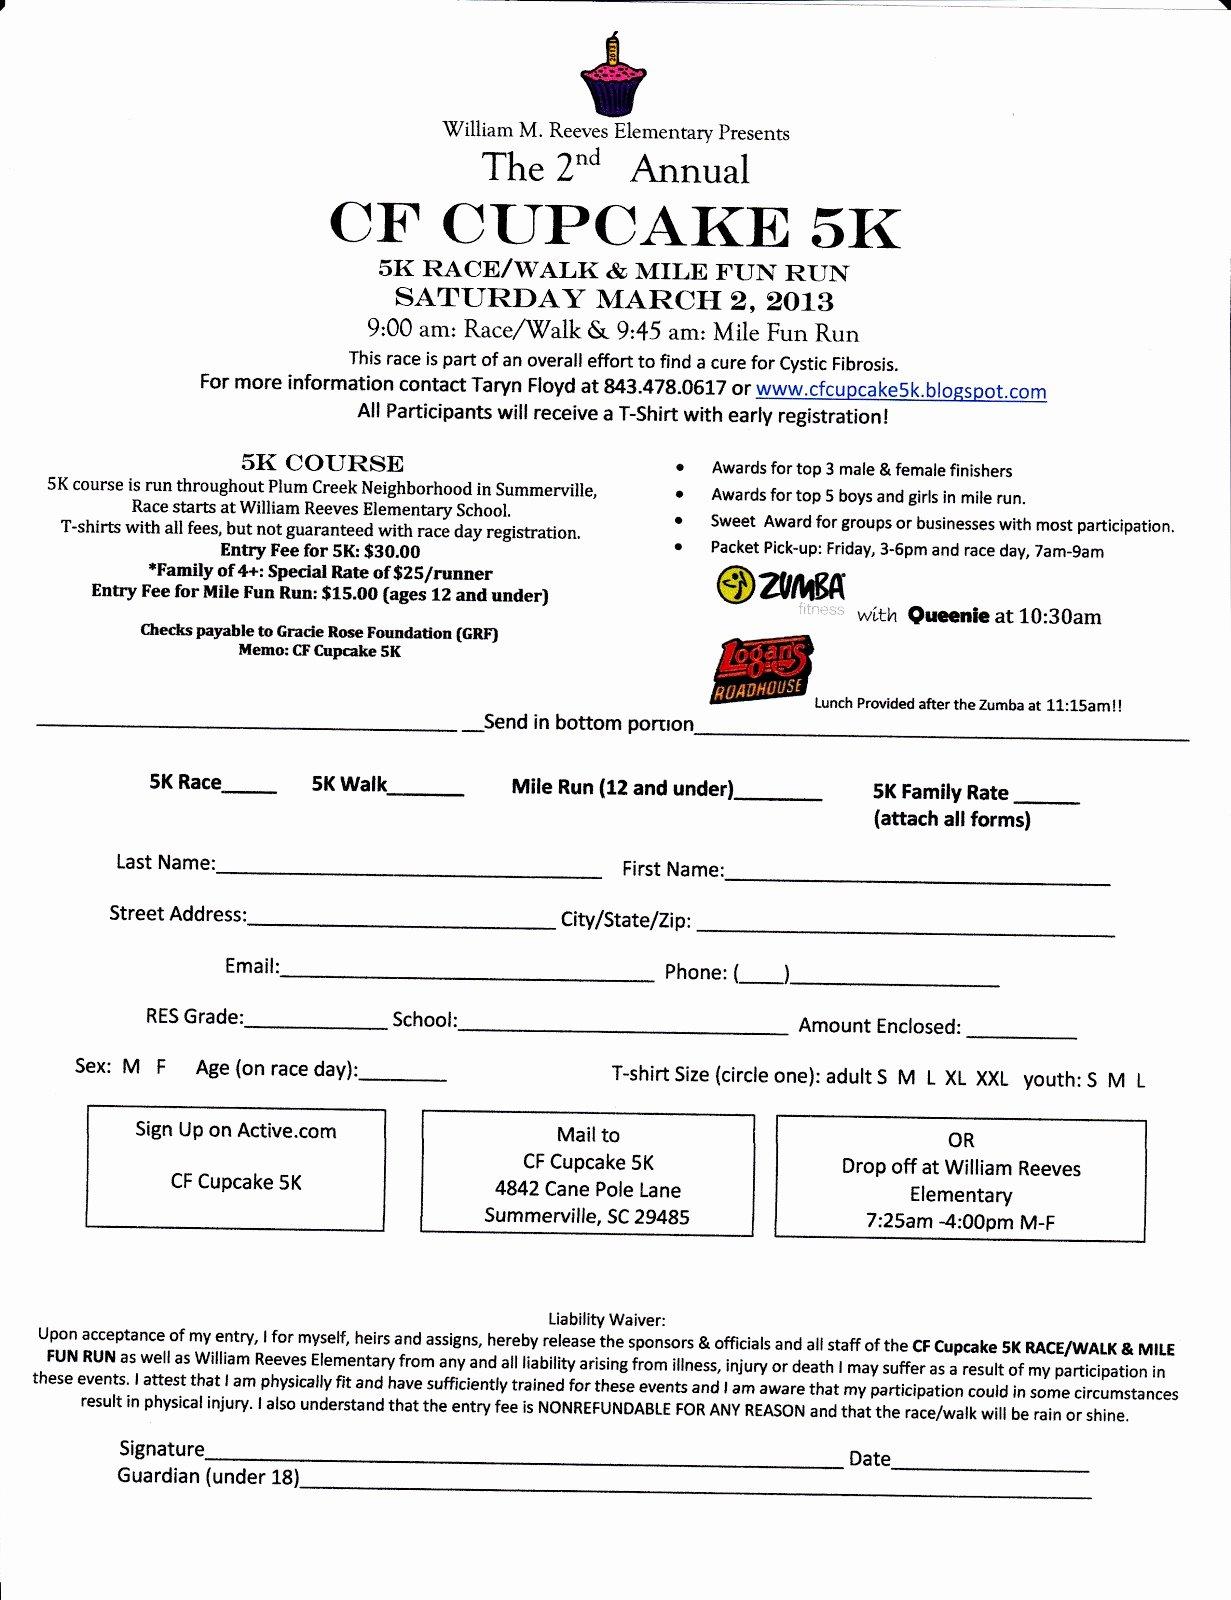 5k Registration form Template Luxury 5k Sign Up Sheet Template